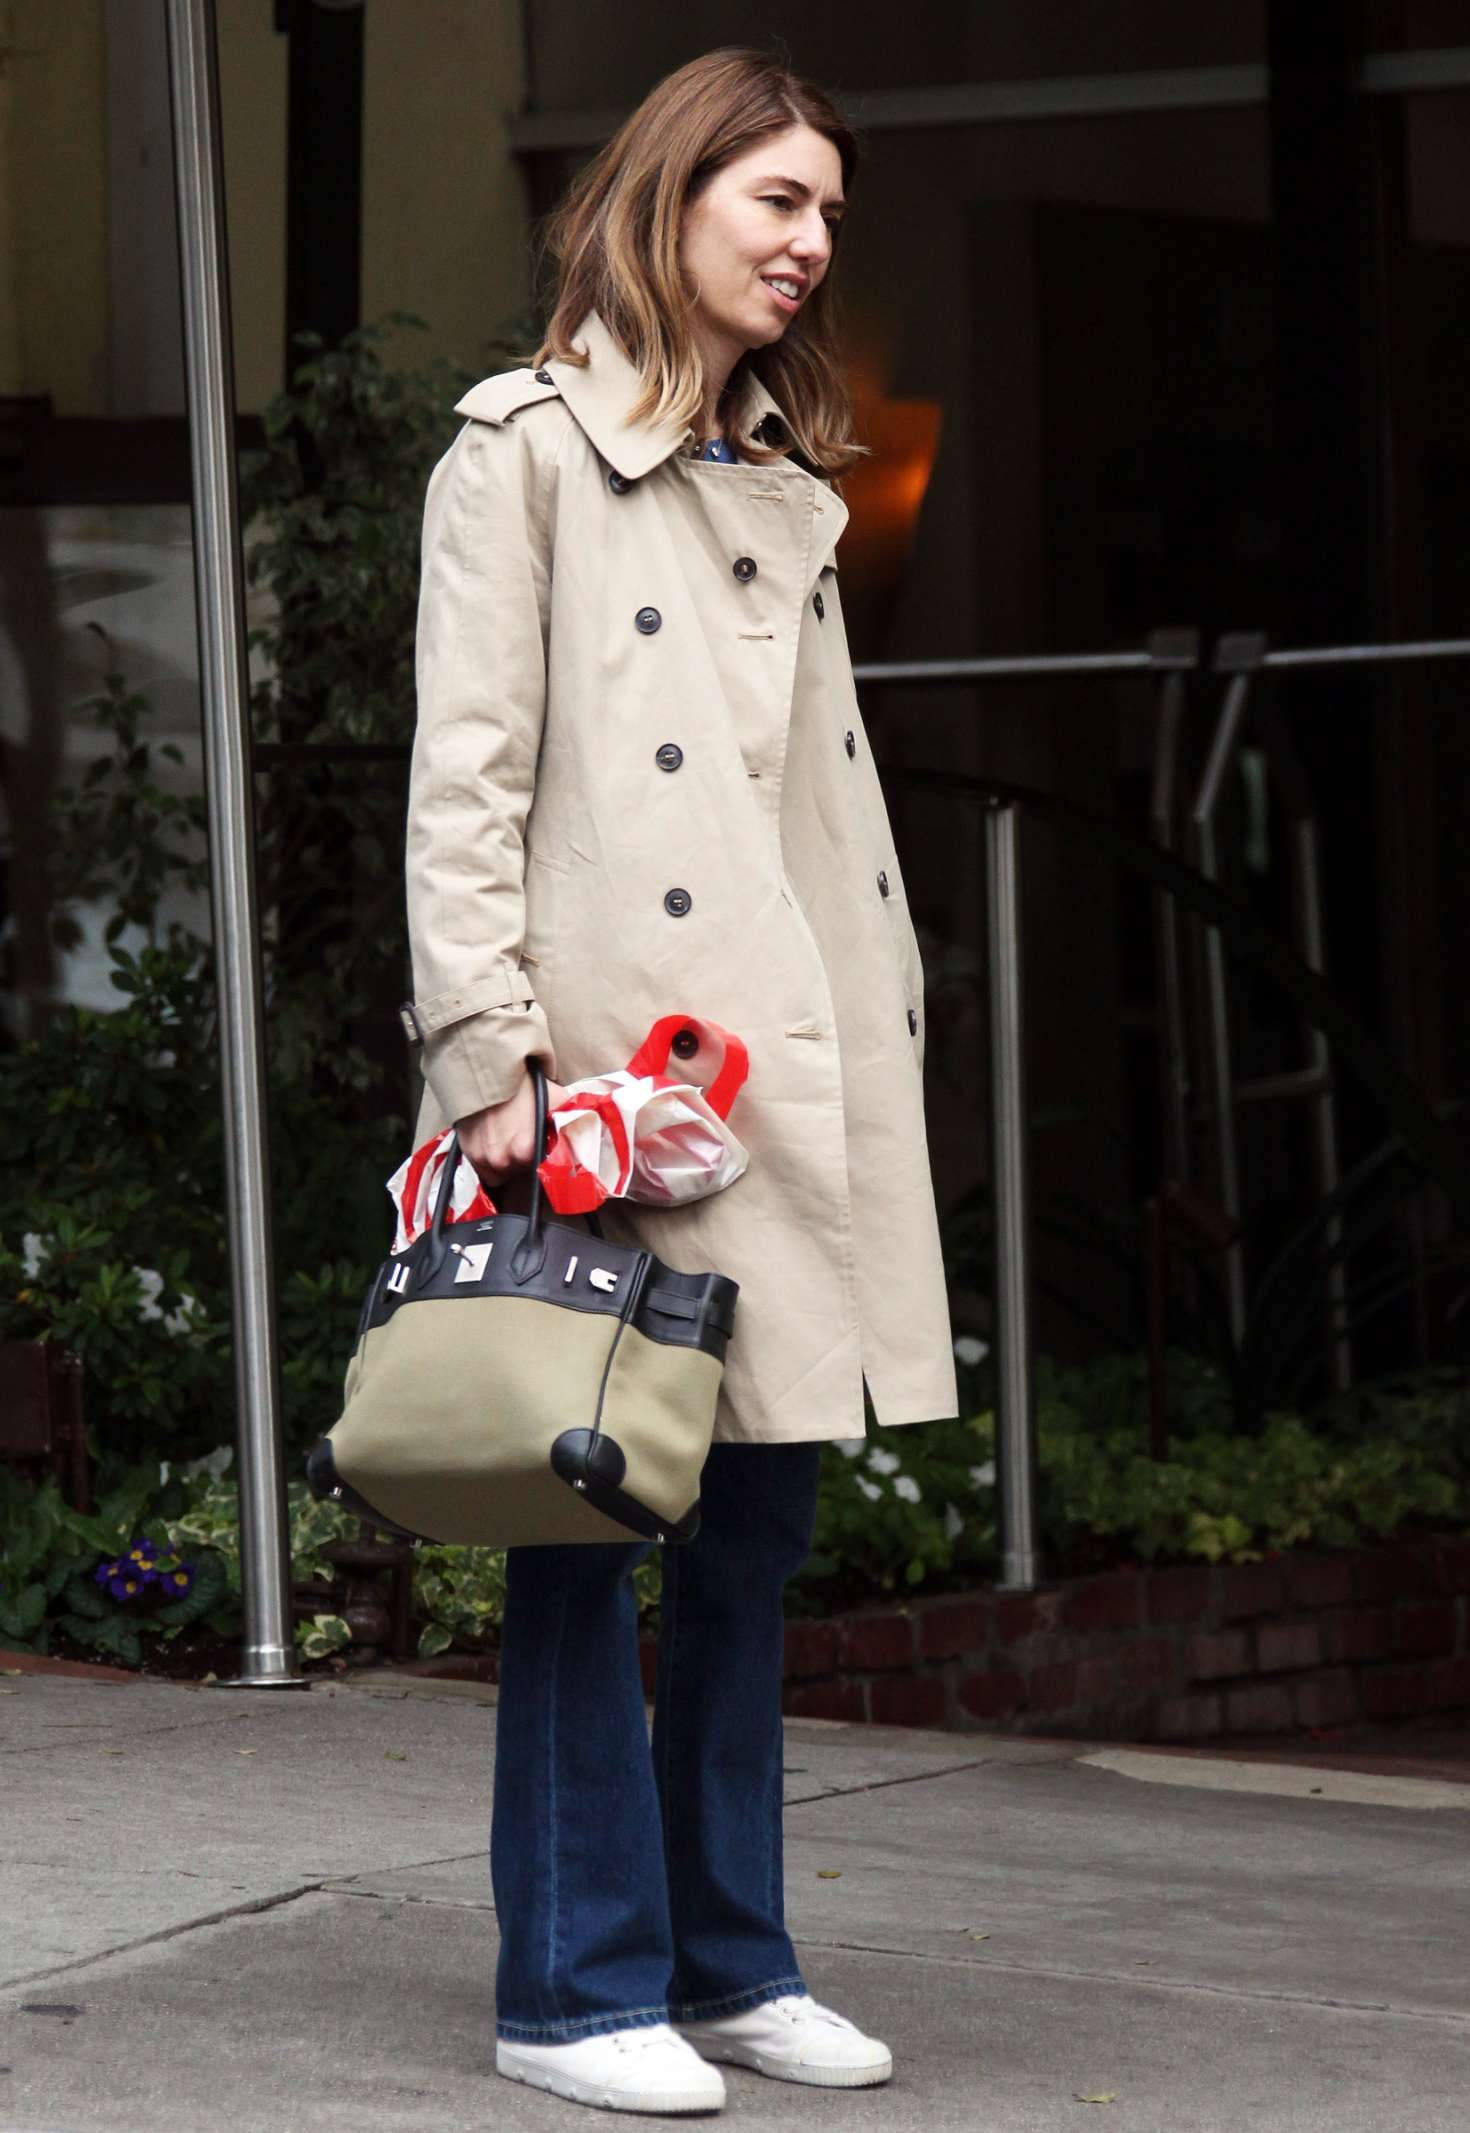 Sofia Coppola Trench Coat I 2019 Sofia Coppola Style